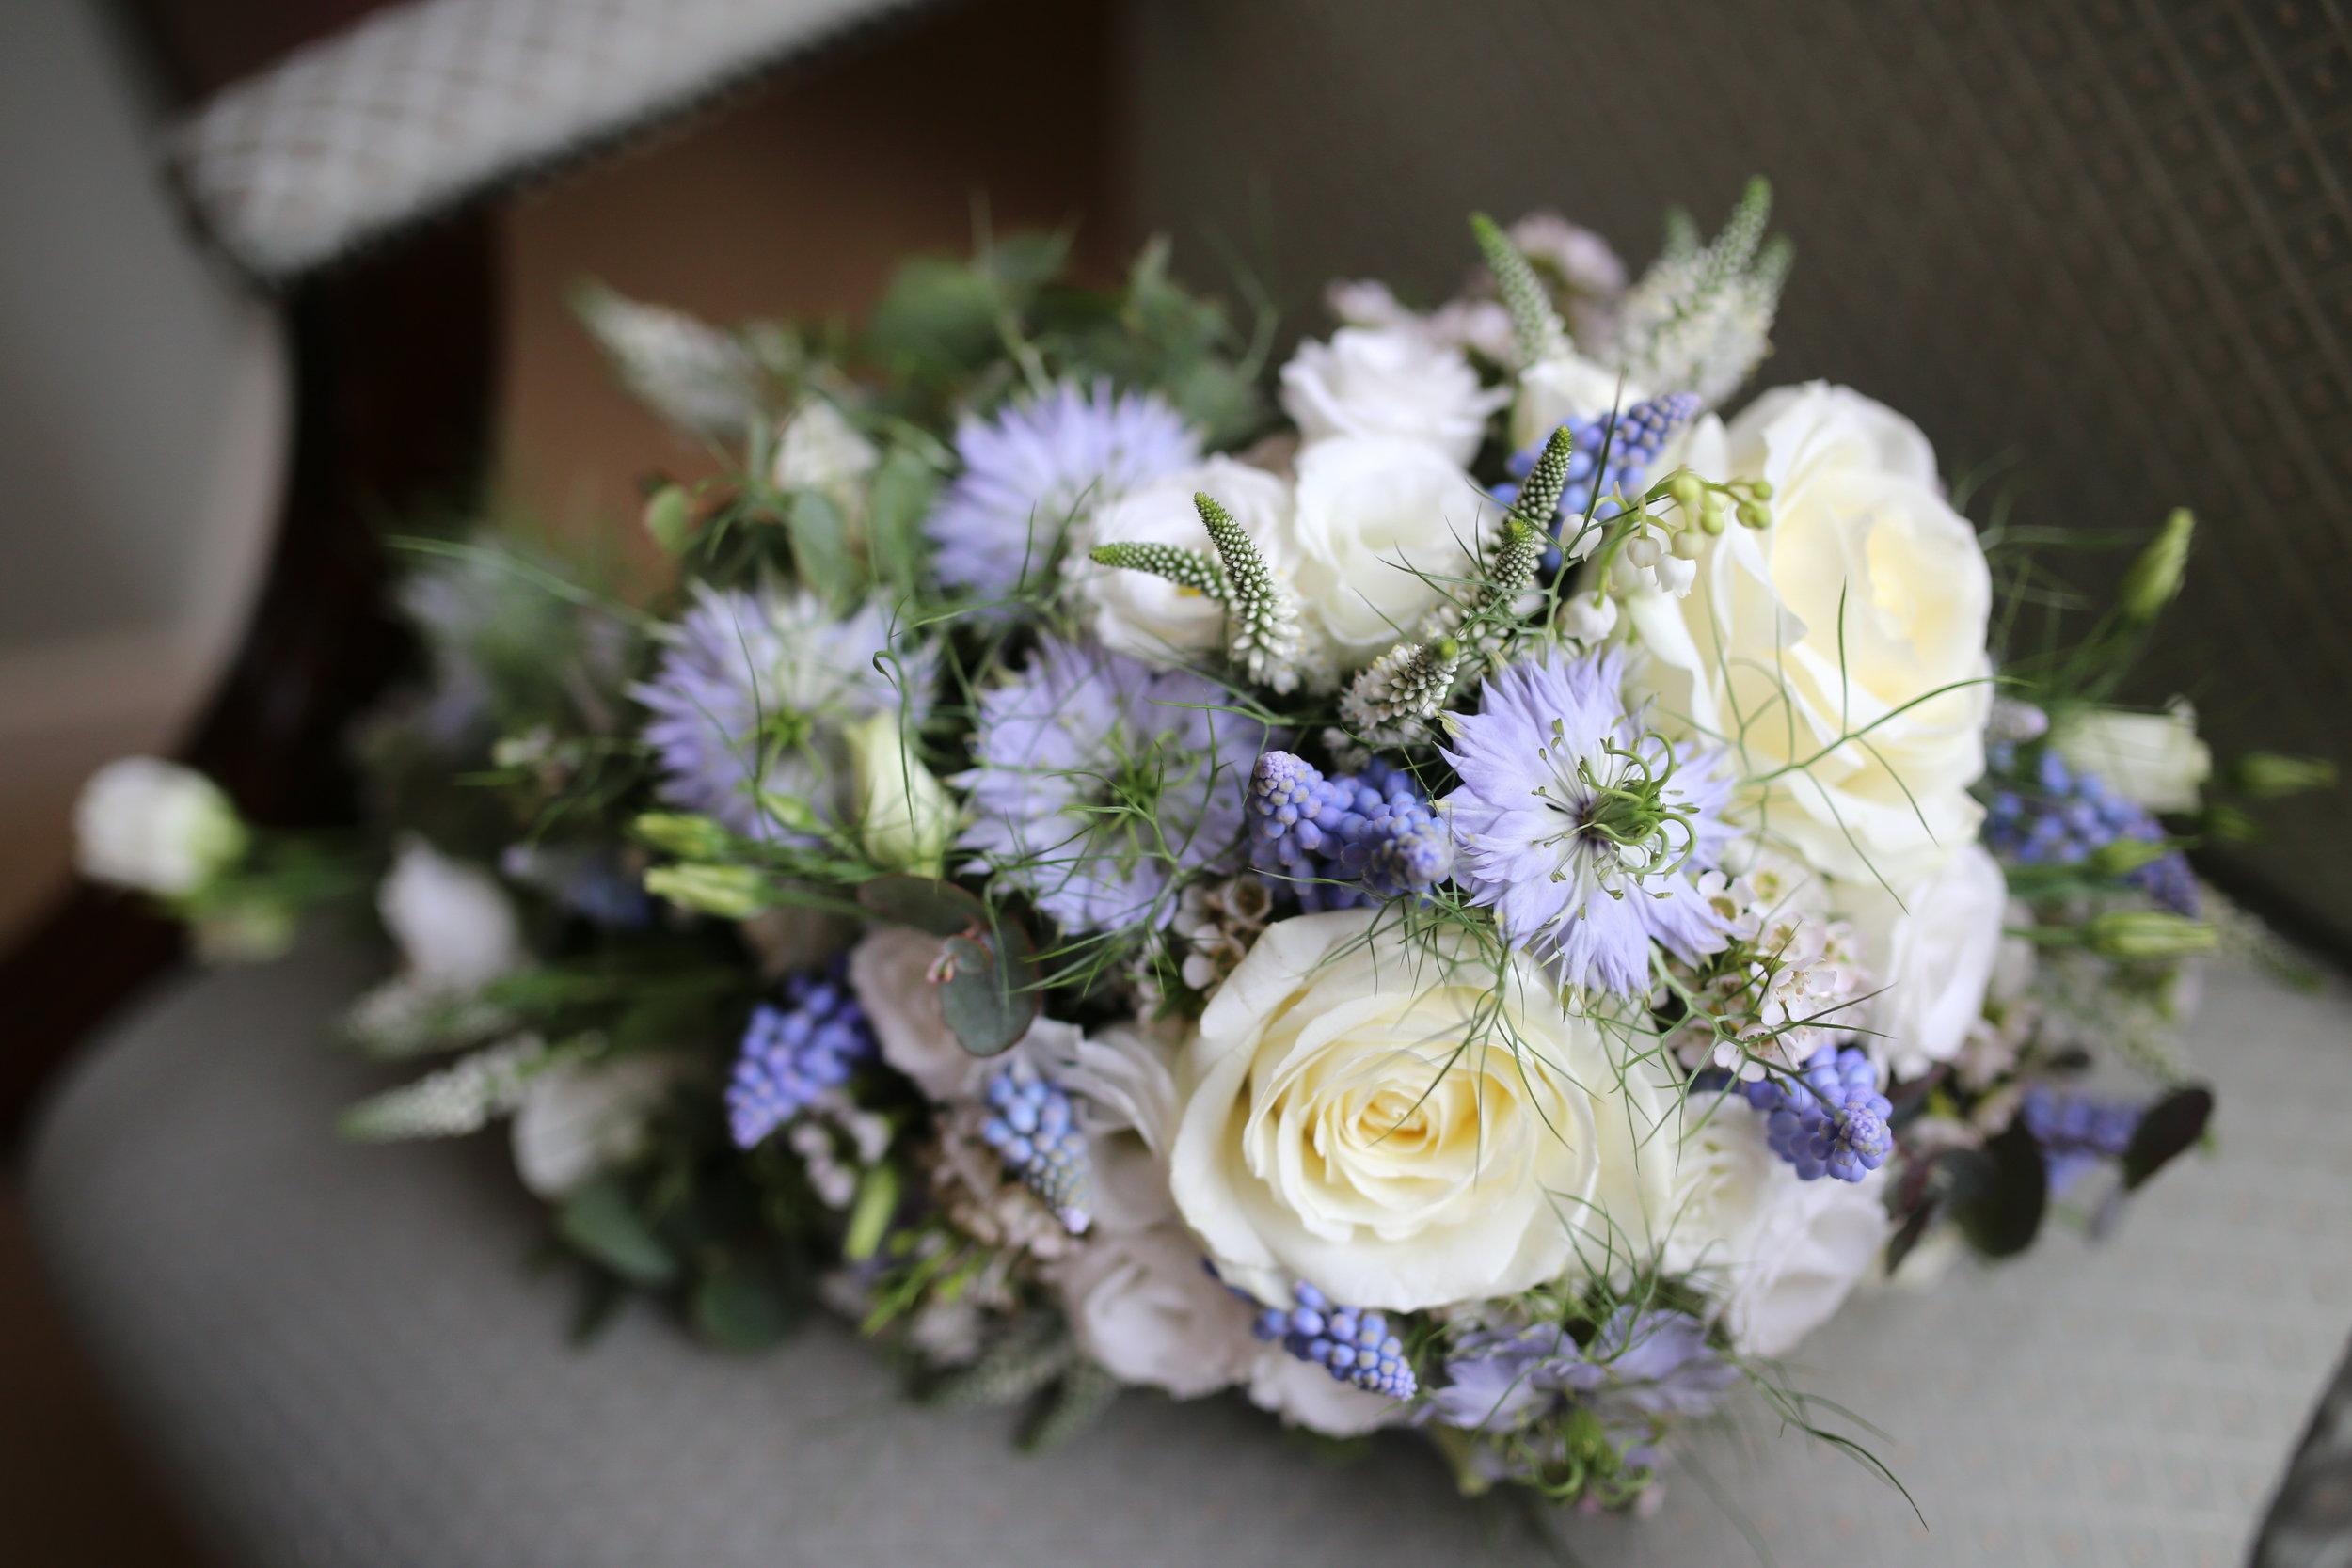 MIRIAM_FAITH_WEDDING_FLOWERS_BRIDE_BOUQUET_BLUE_WHITE_NIGELLA_ROSES_CASCADE.JPG